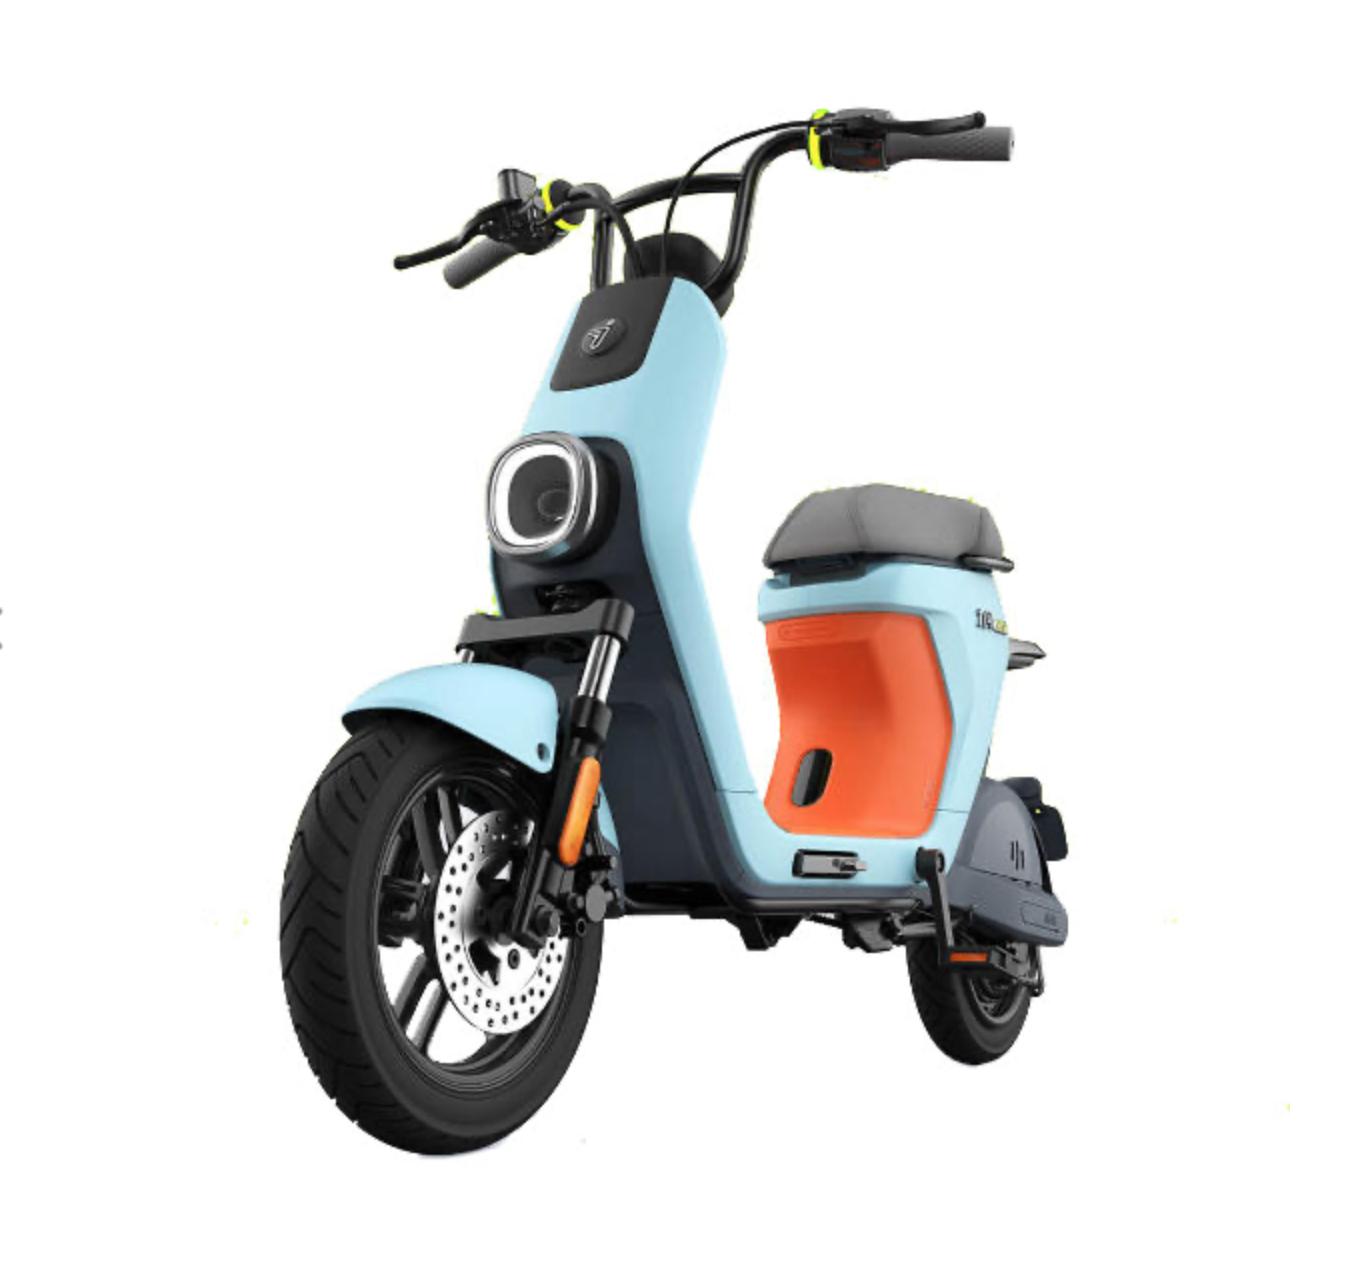 Xiaomi Ninebot c40 electric bike features